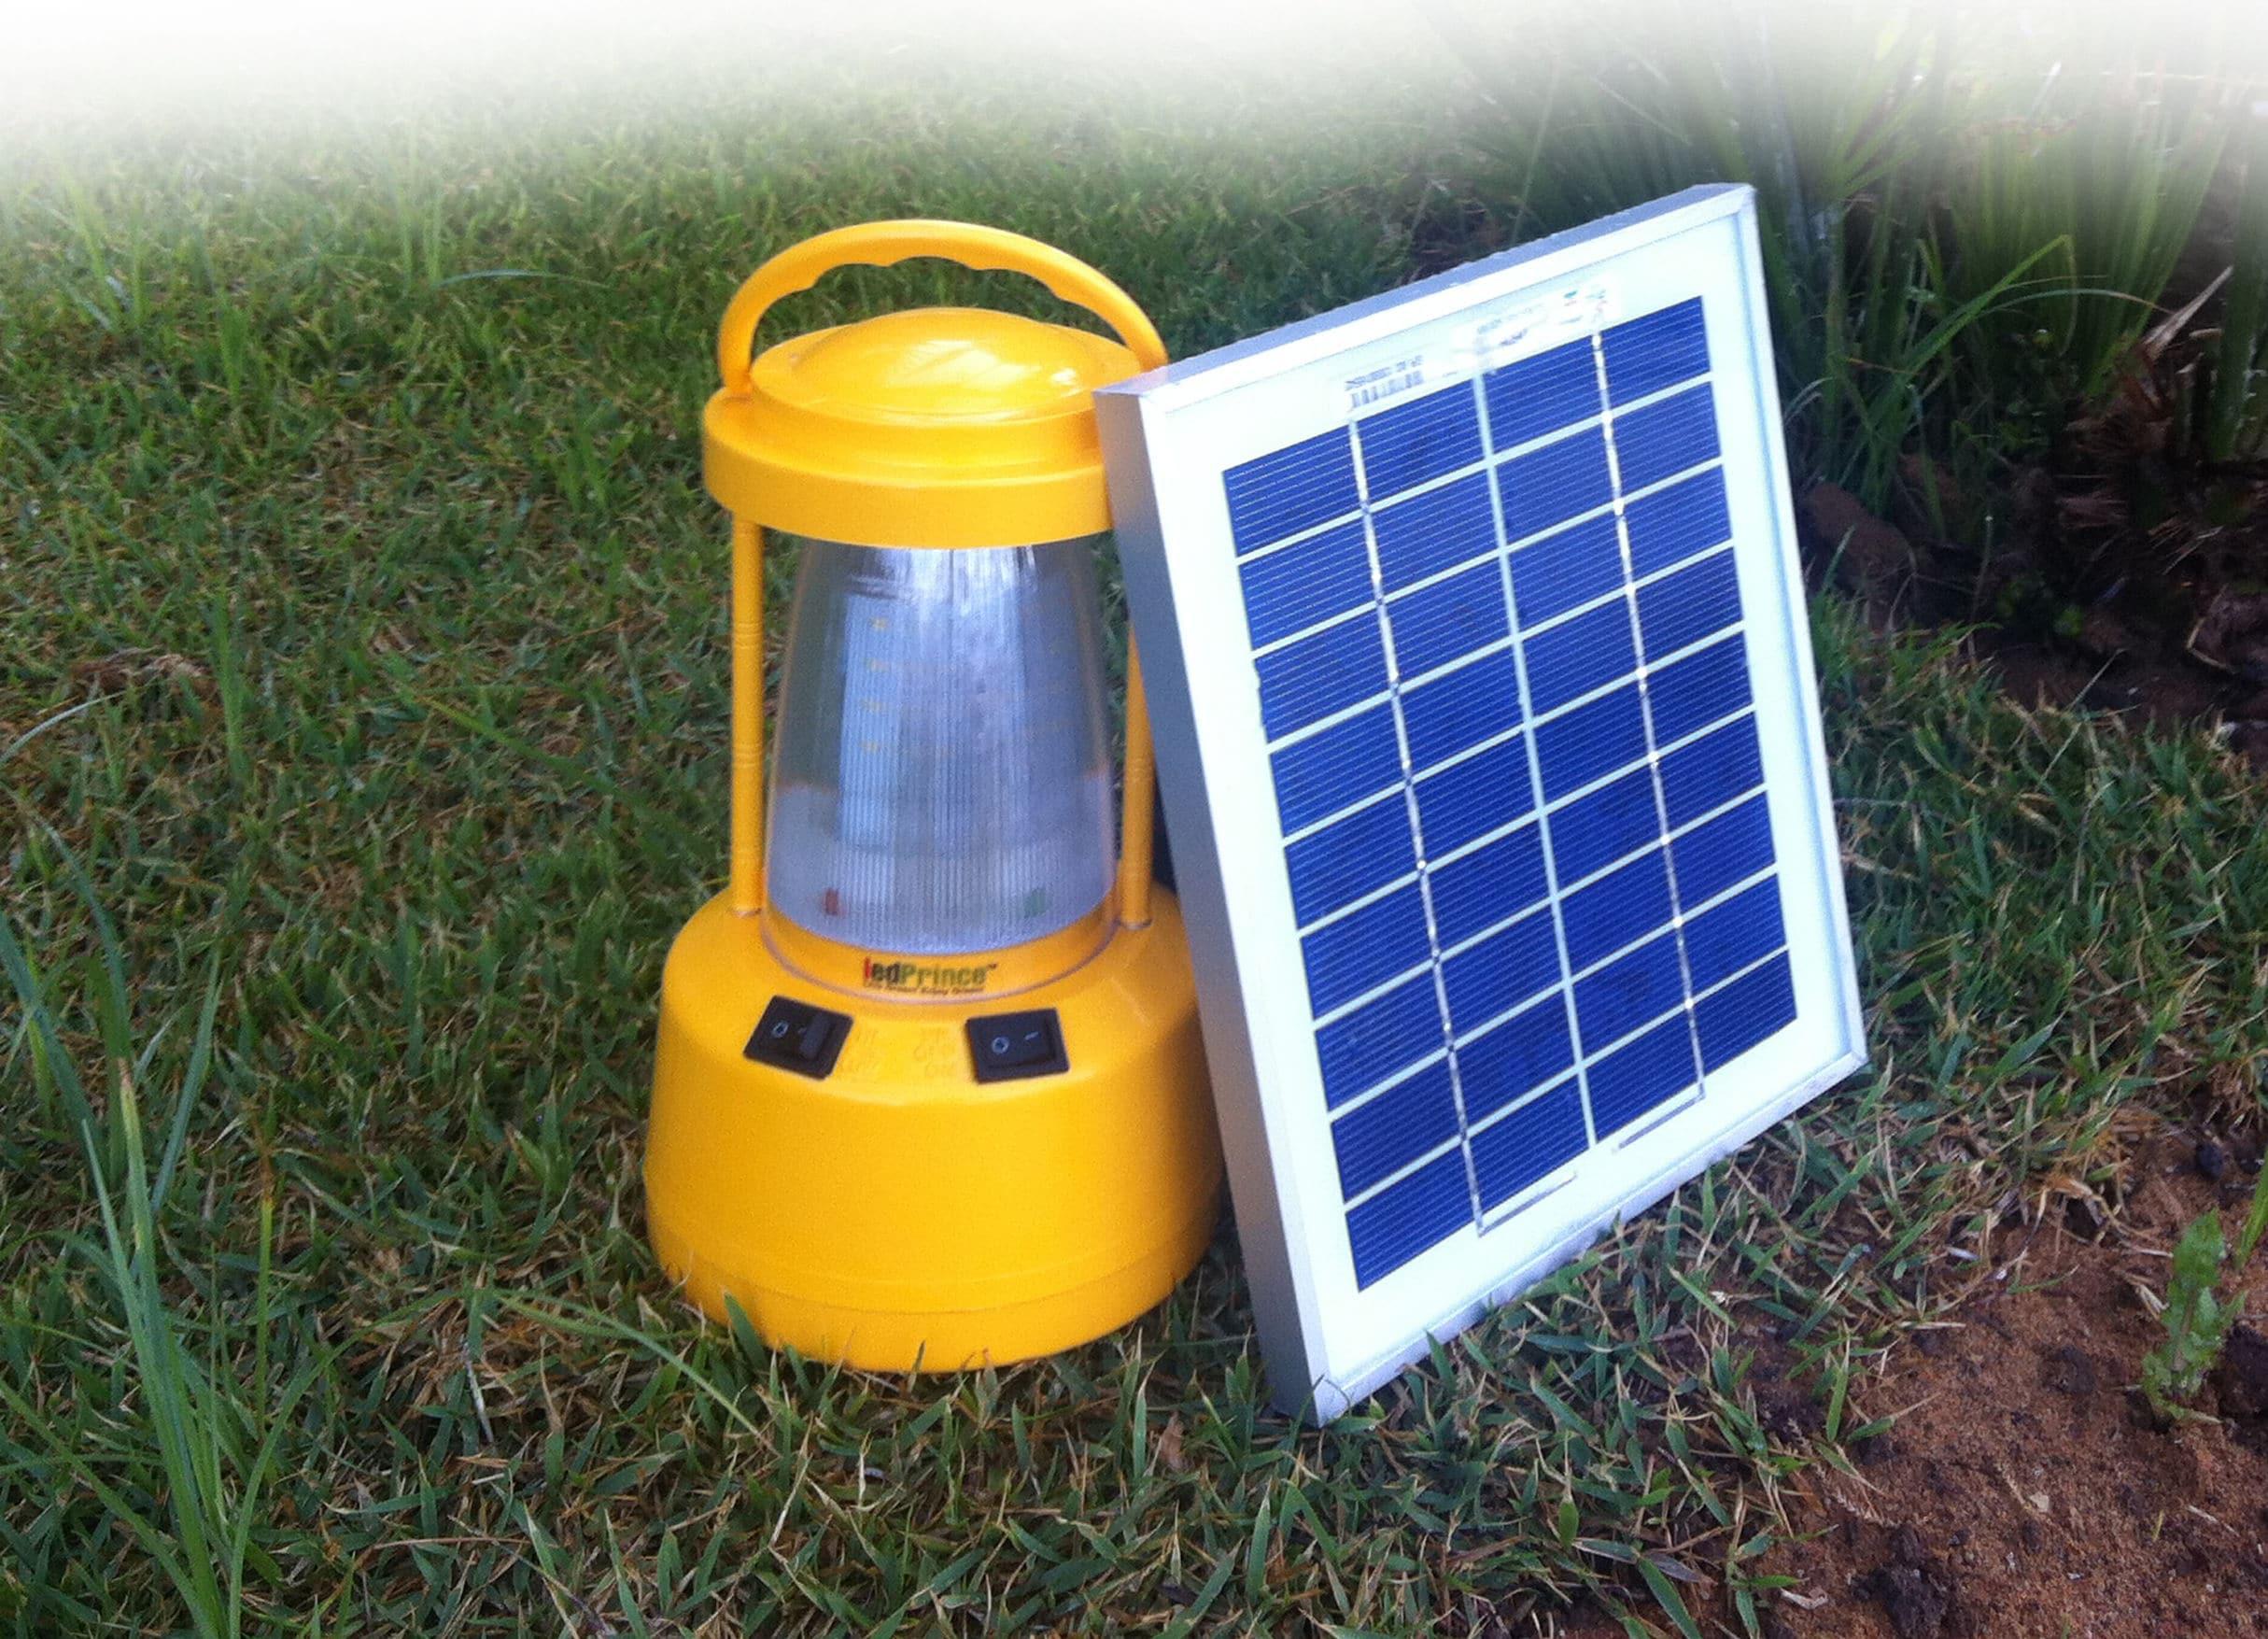 Digging Deep Into The Indian Solar Lantern Market